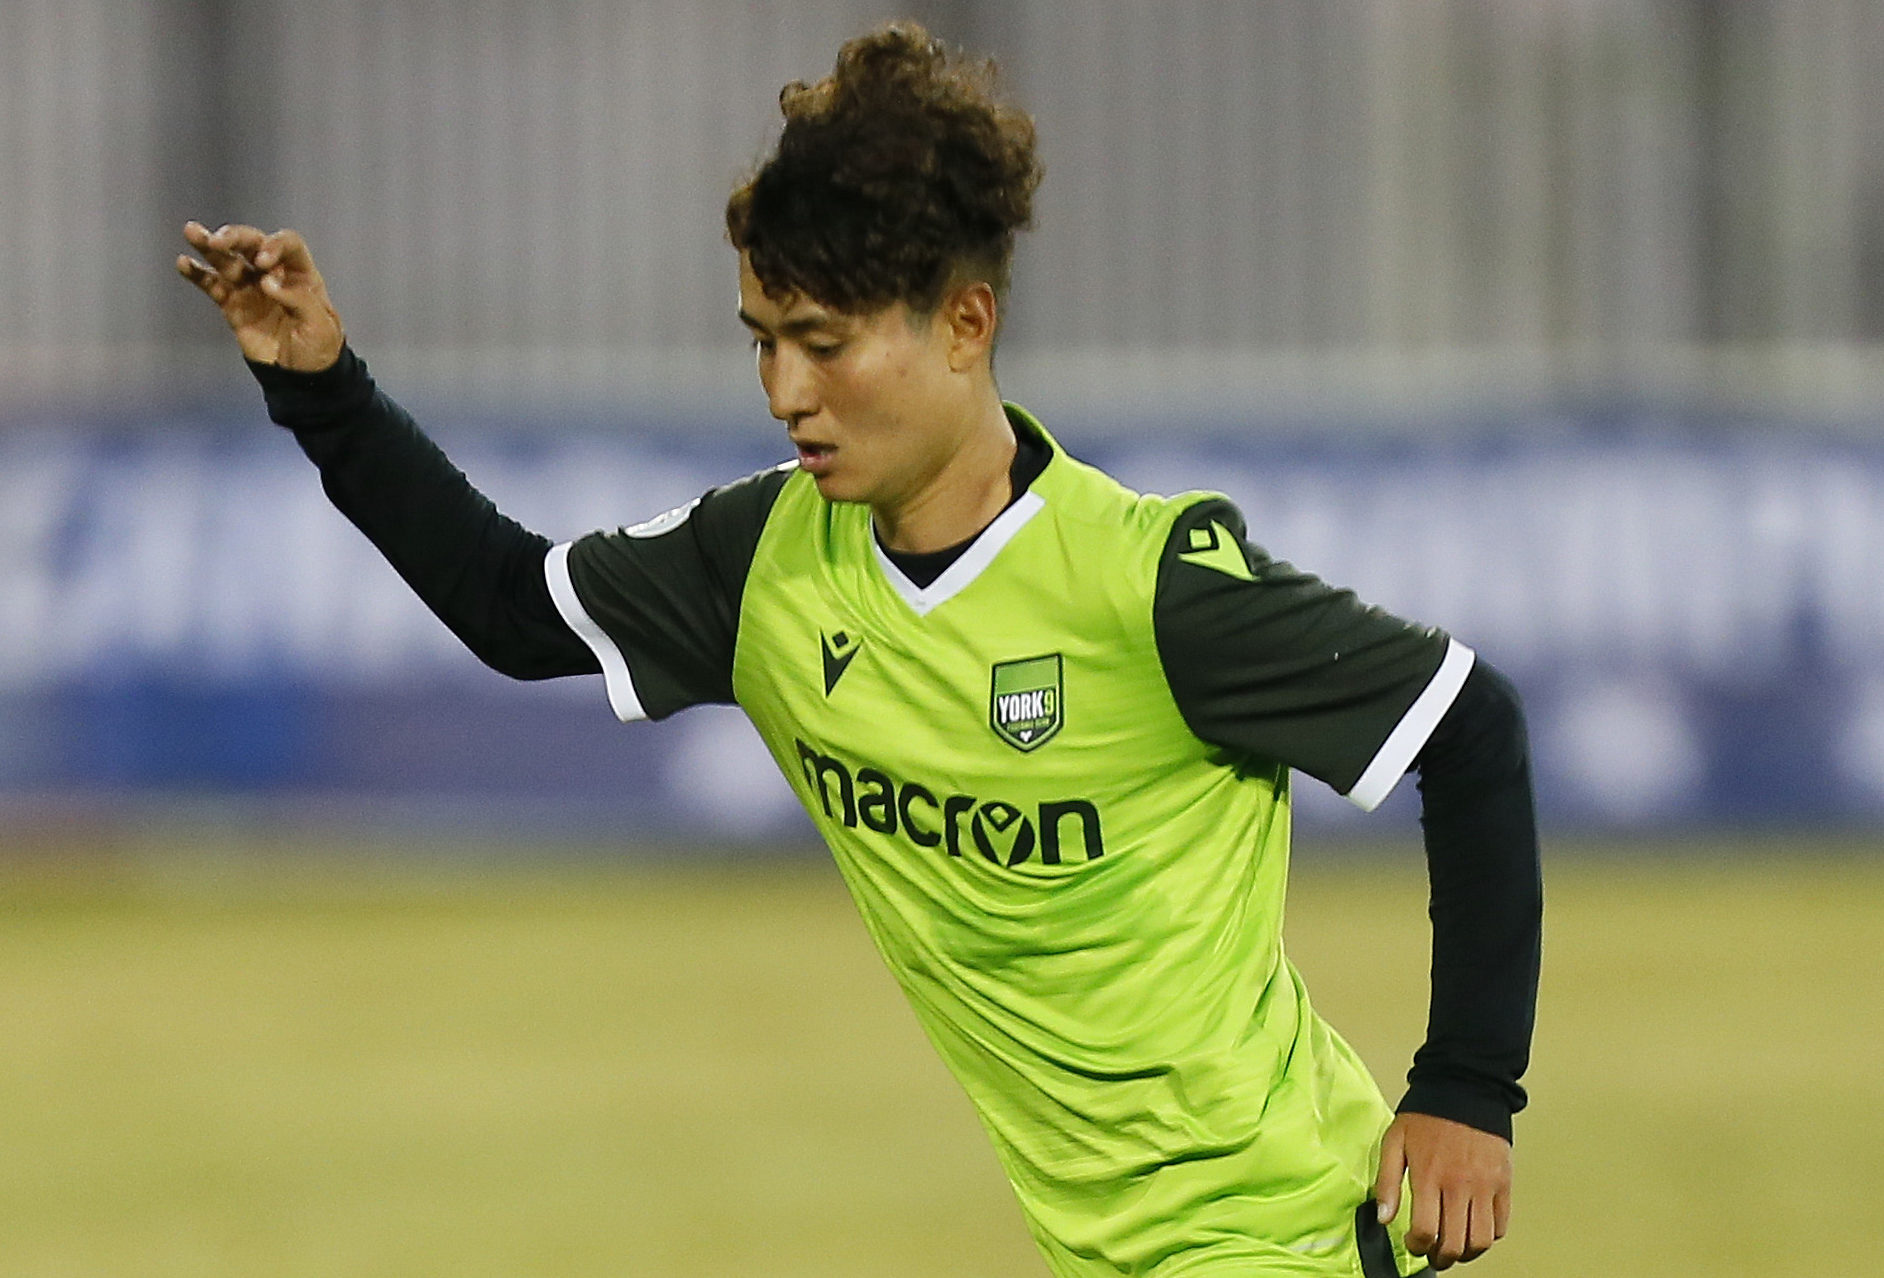 York9 Fc S Emilio Estevez Sold To Dutch Eredivisie Side Ado Den Haag Canadian Premier League